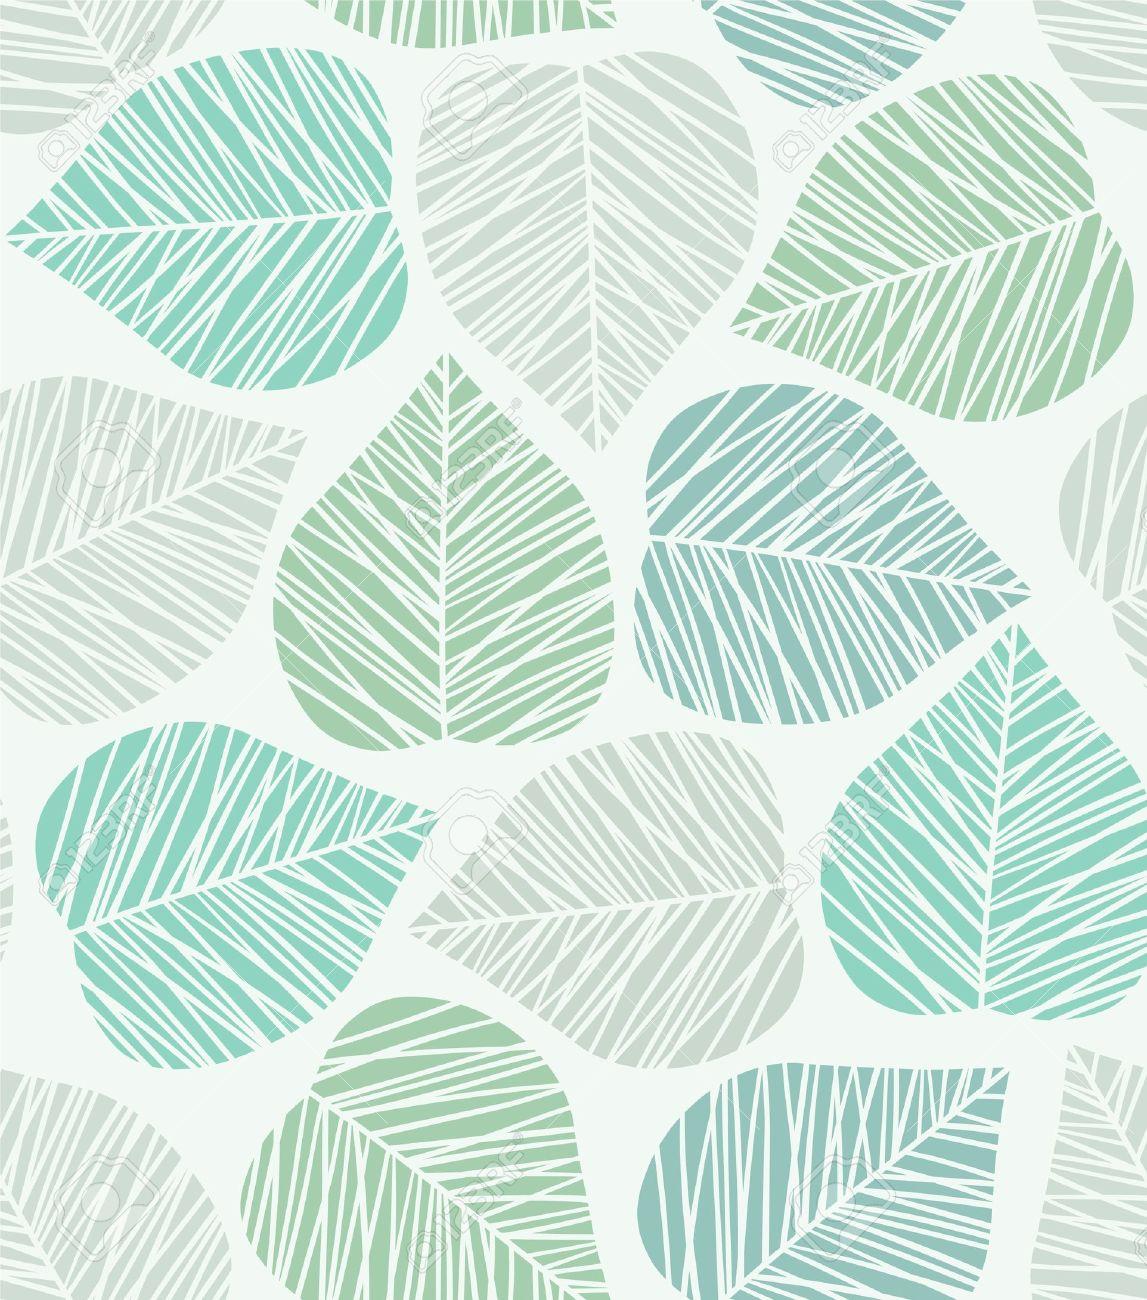 Seamless blue stylized leaf pattern - 15659714